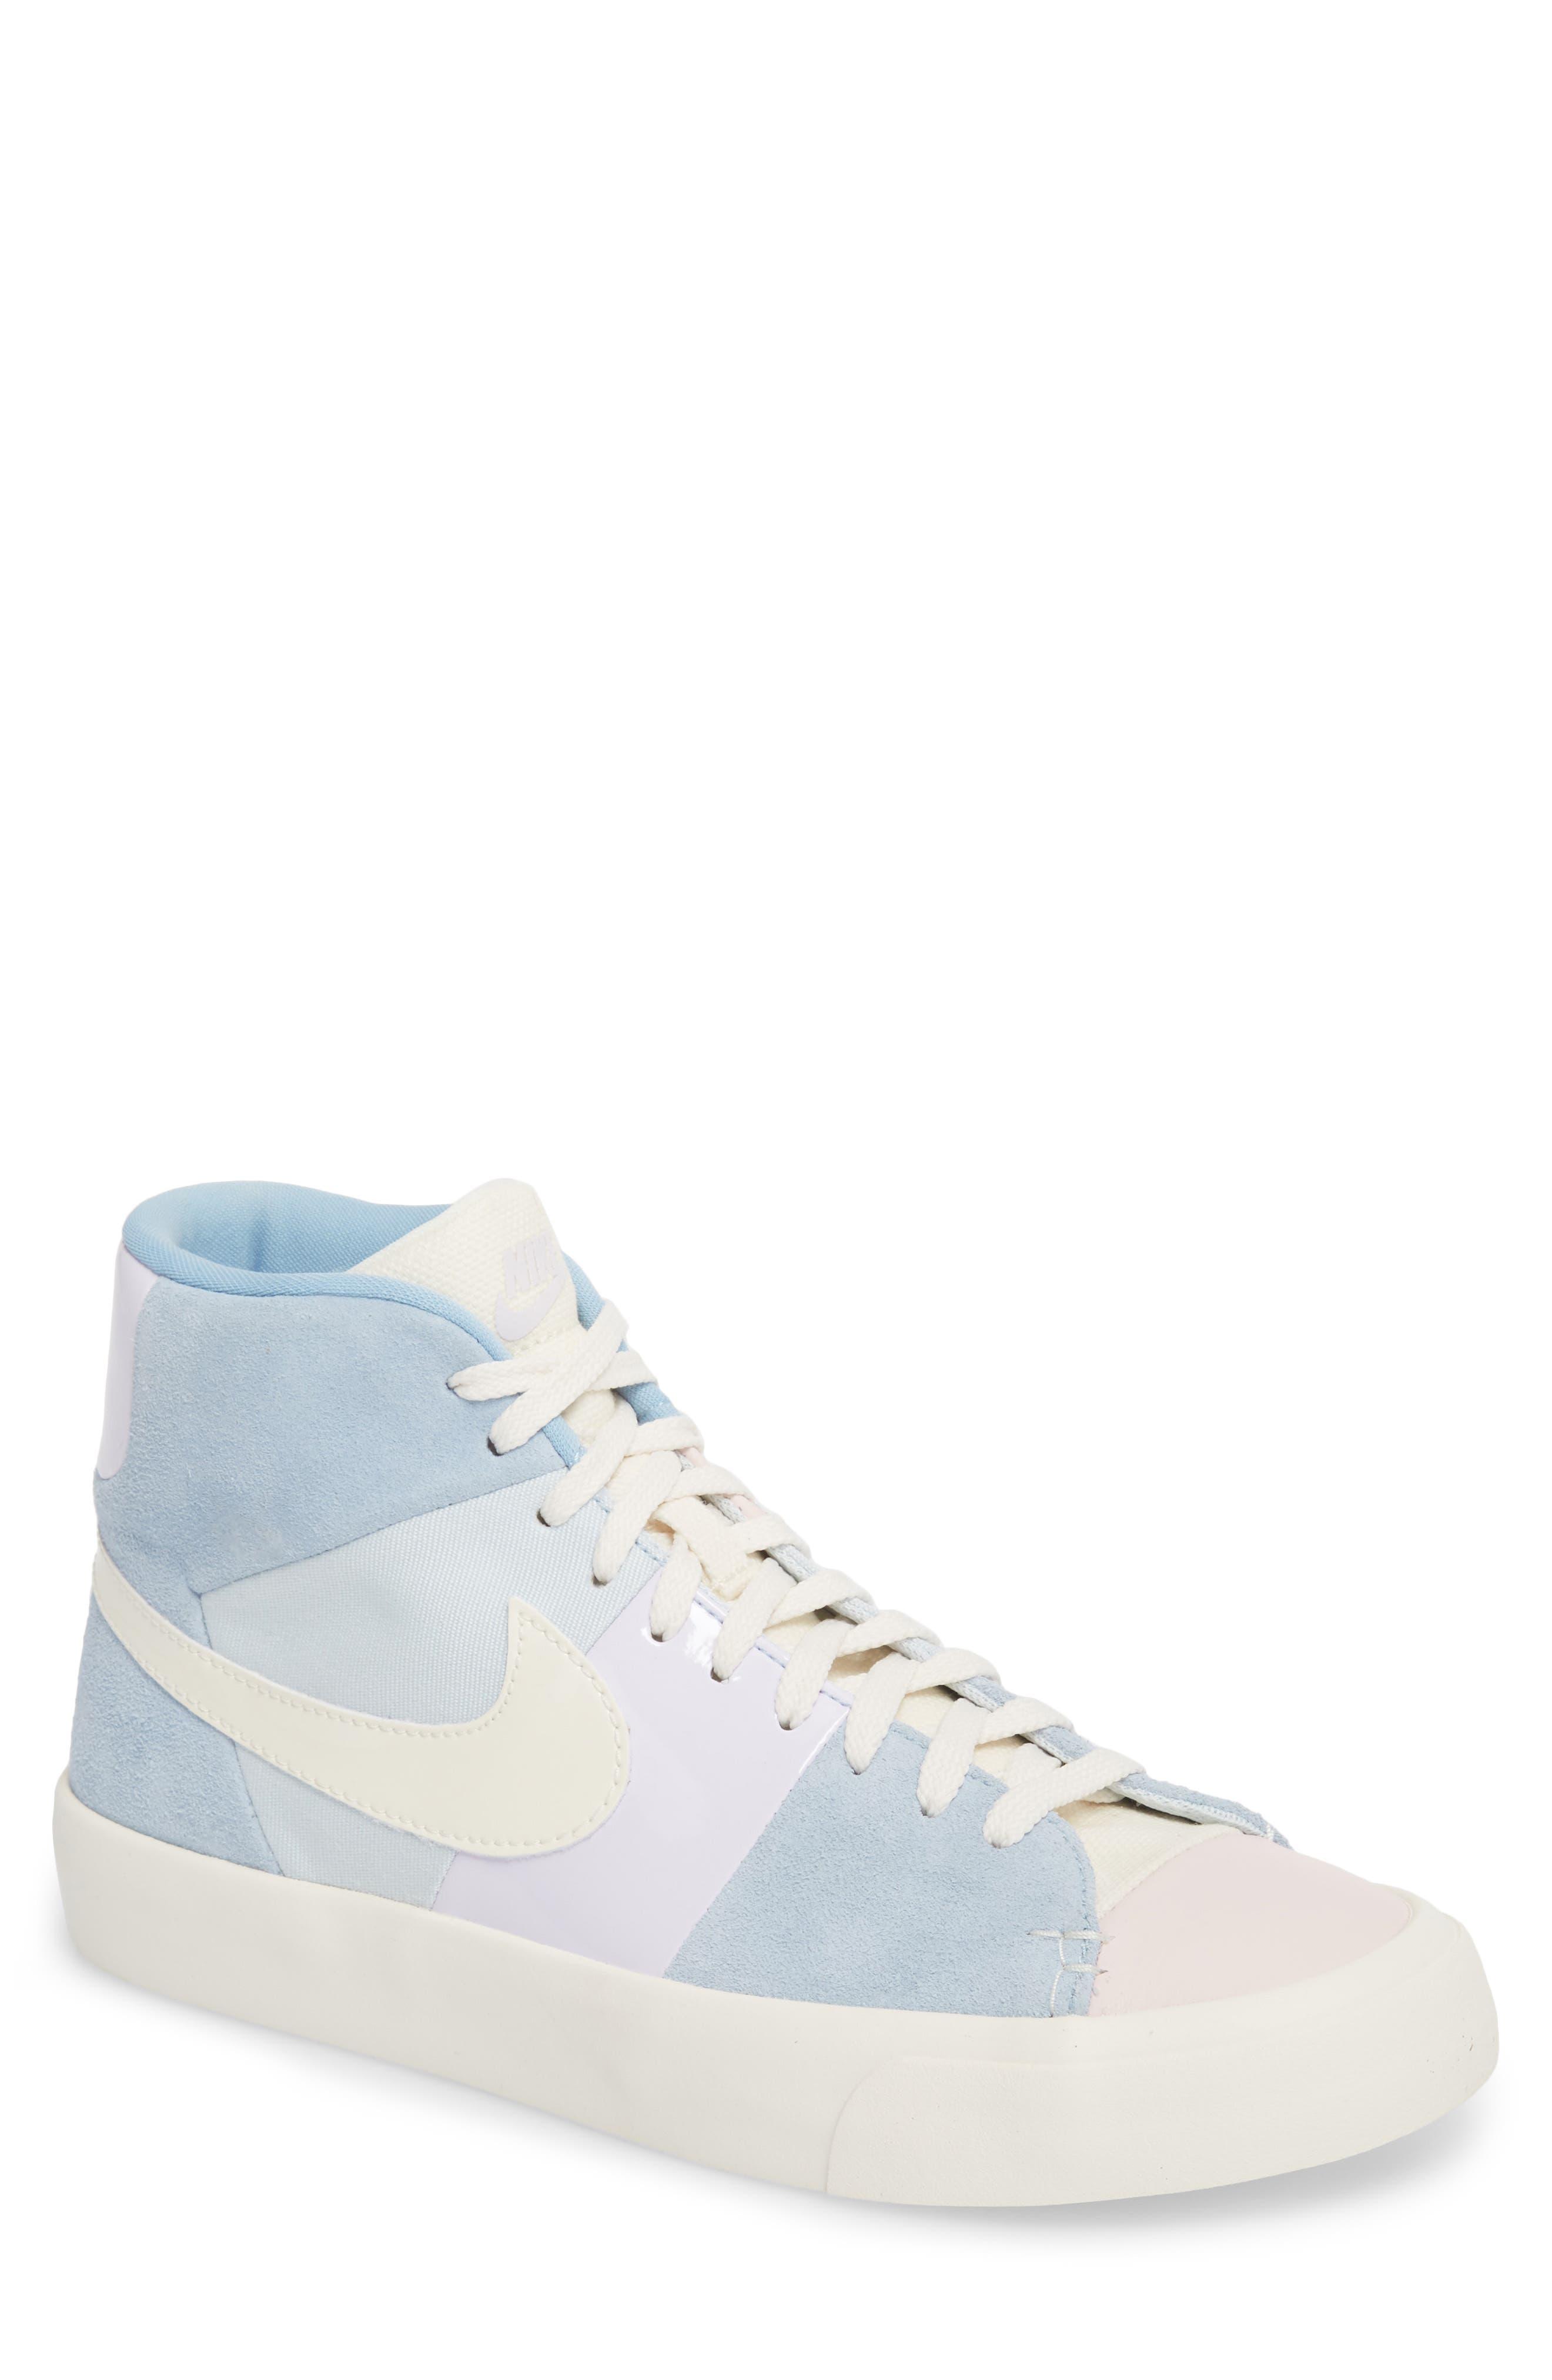 Blazer Royal Easter QS High Top Sneaker,                             Main thumbnail 1, color,                             Arctic Pink/ Sail-Blue-Blue